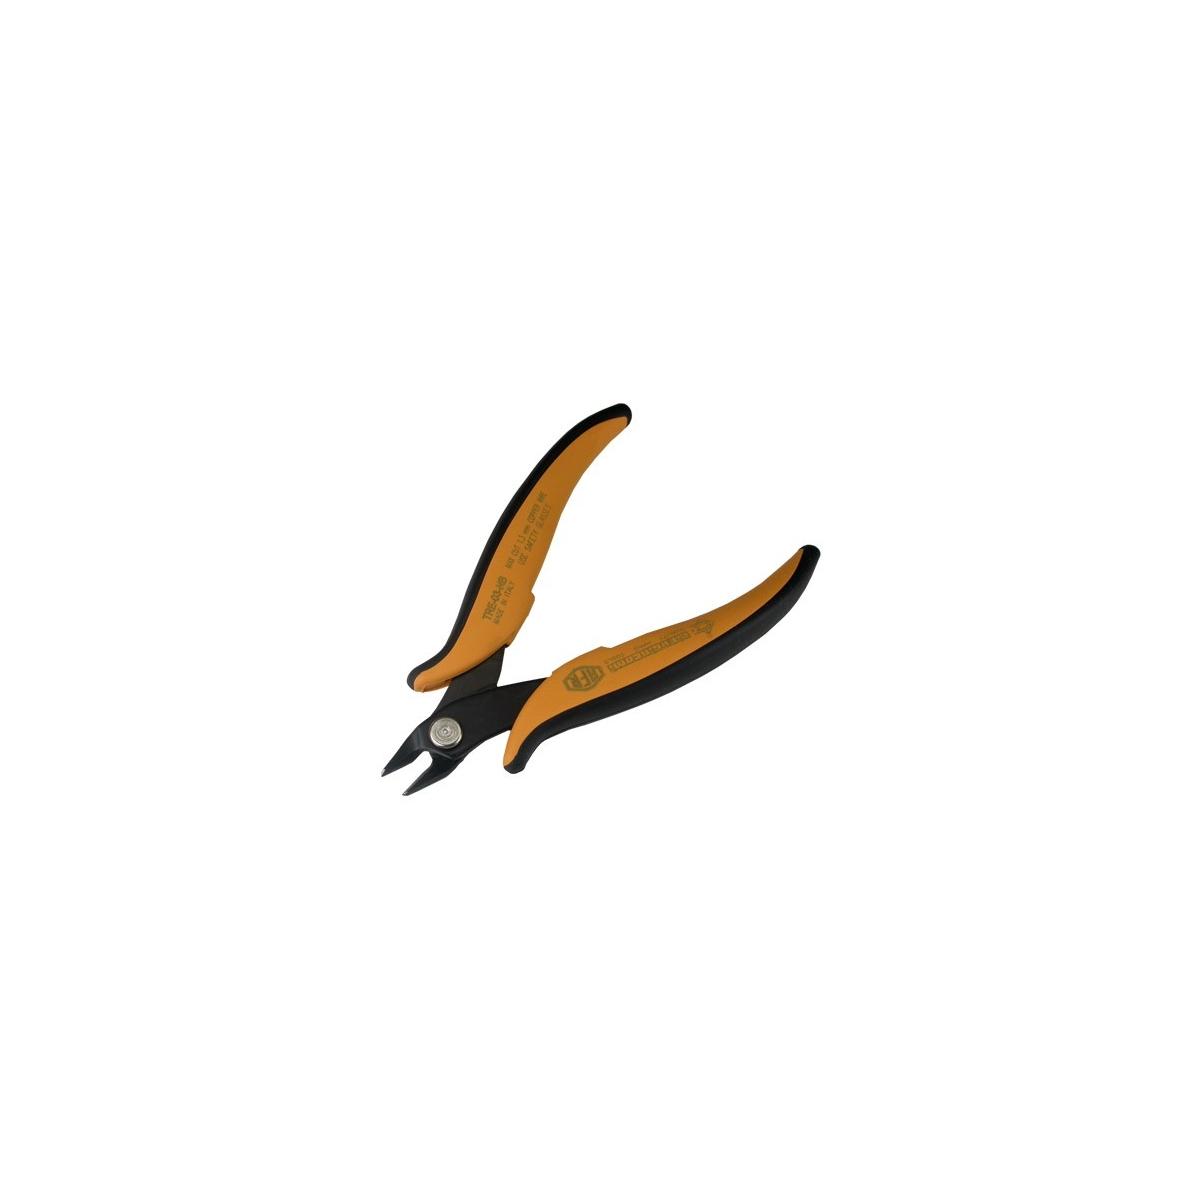 PIERGIACOMI - ALICATE DE CORTE MOD.TRE 03NB-C/CLIP